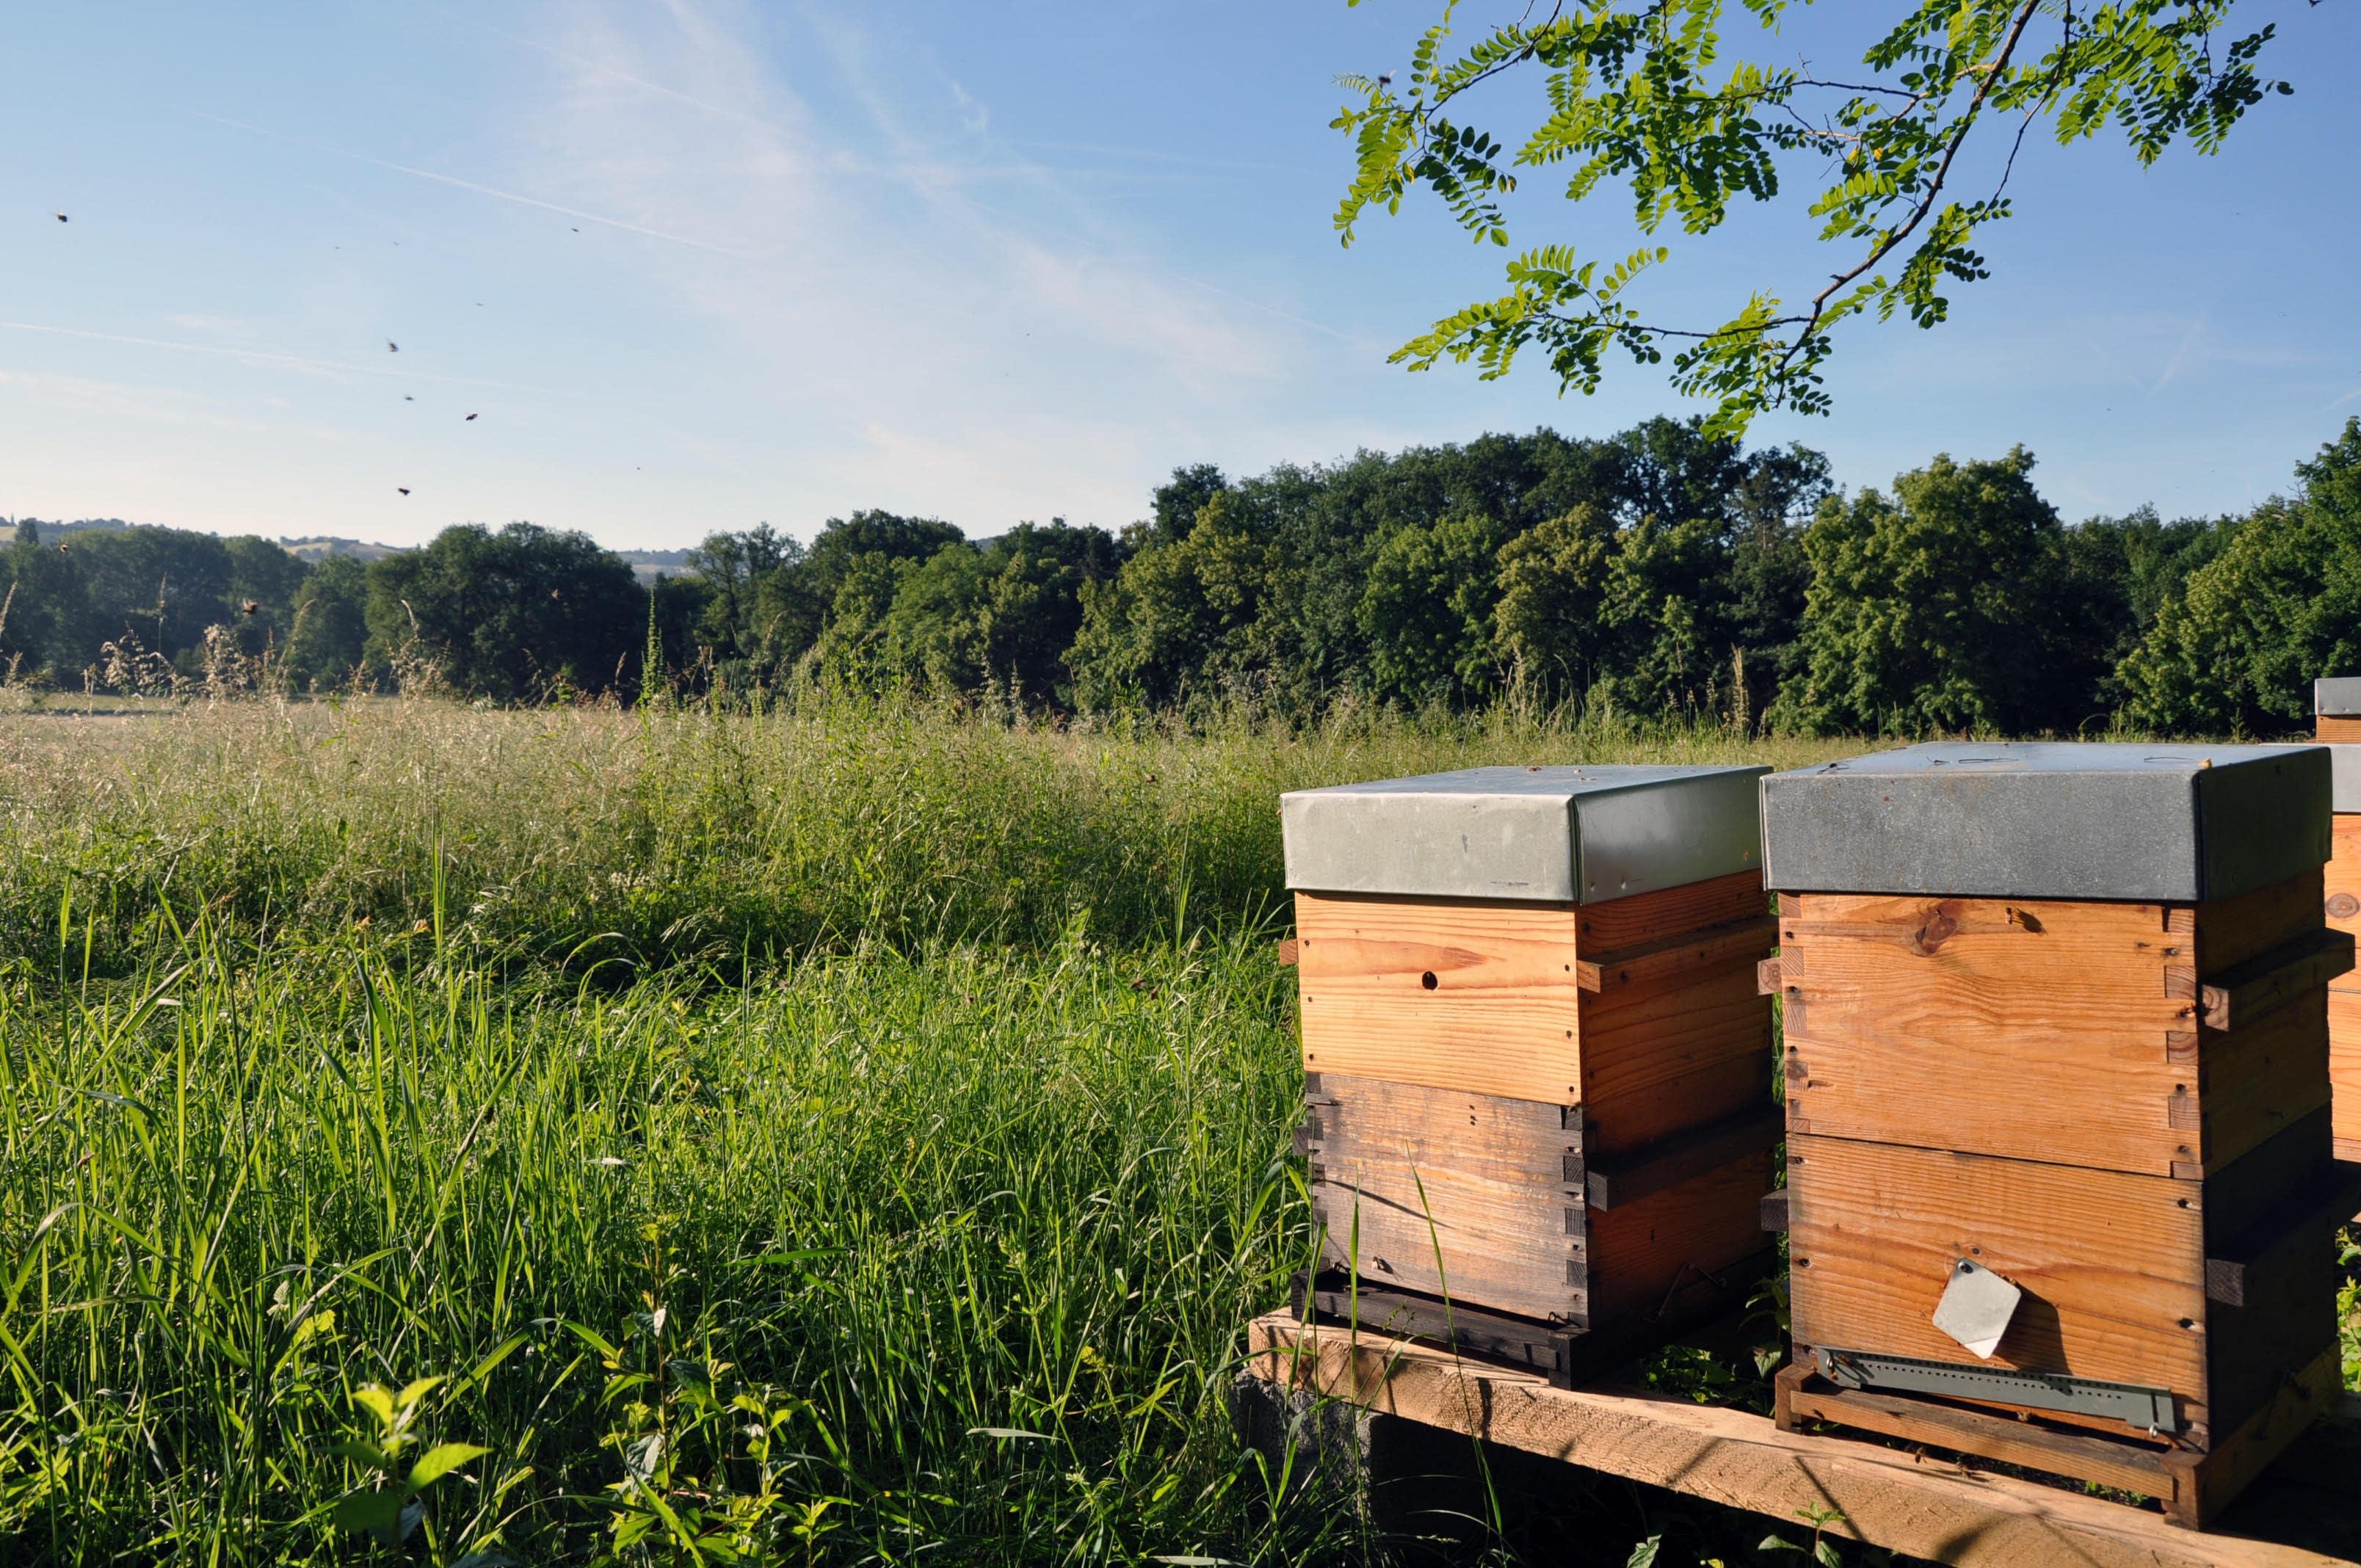 abeille-fleur-hors-cadre.jpg